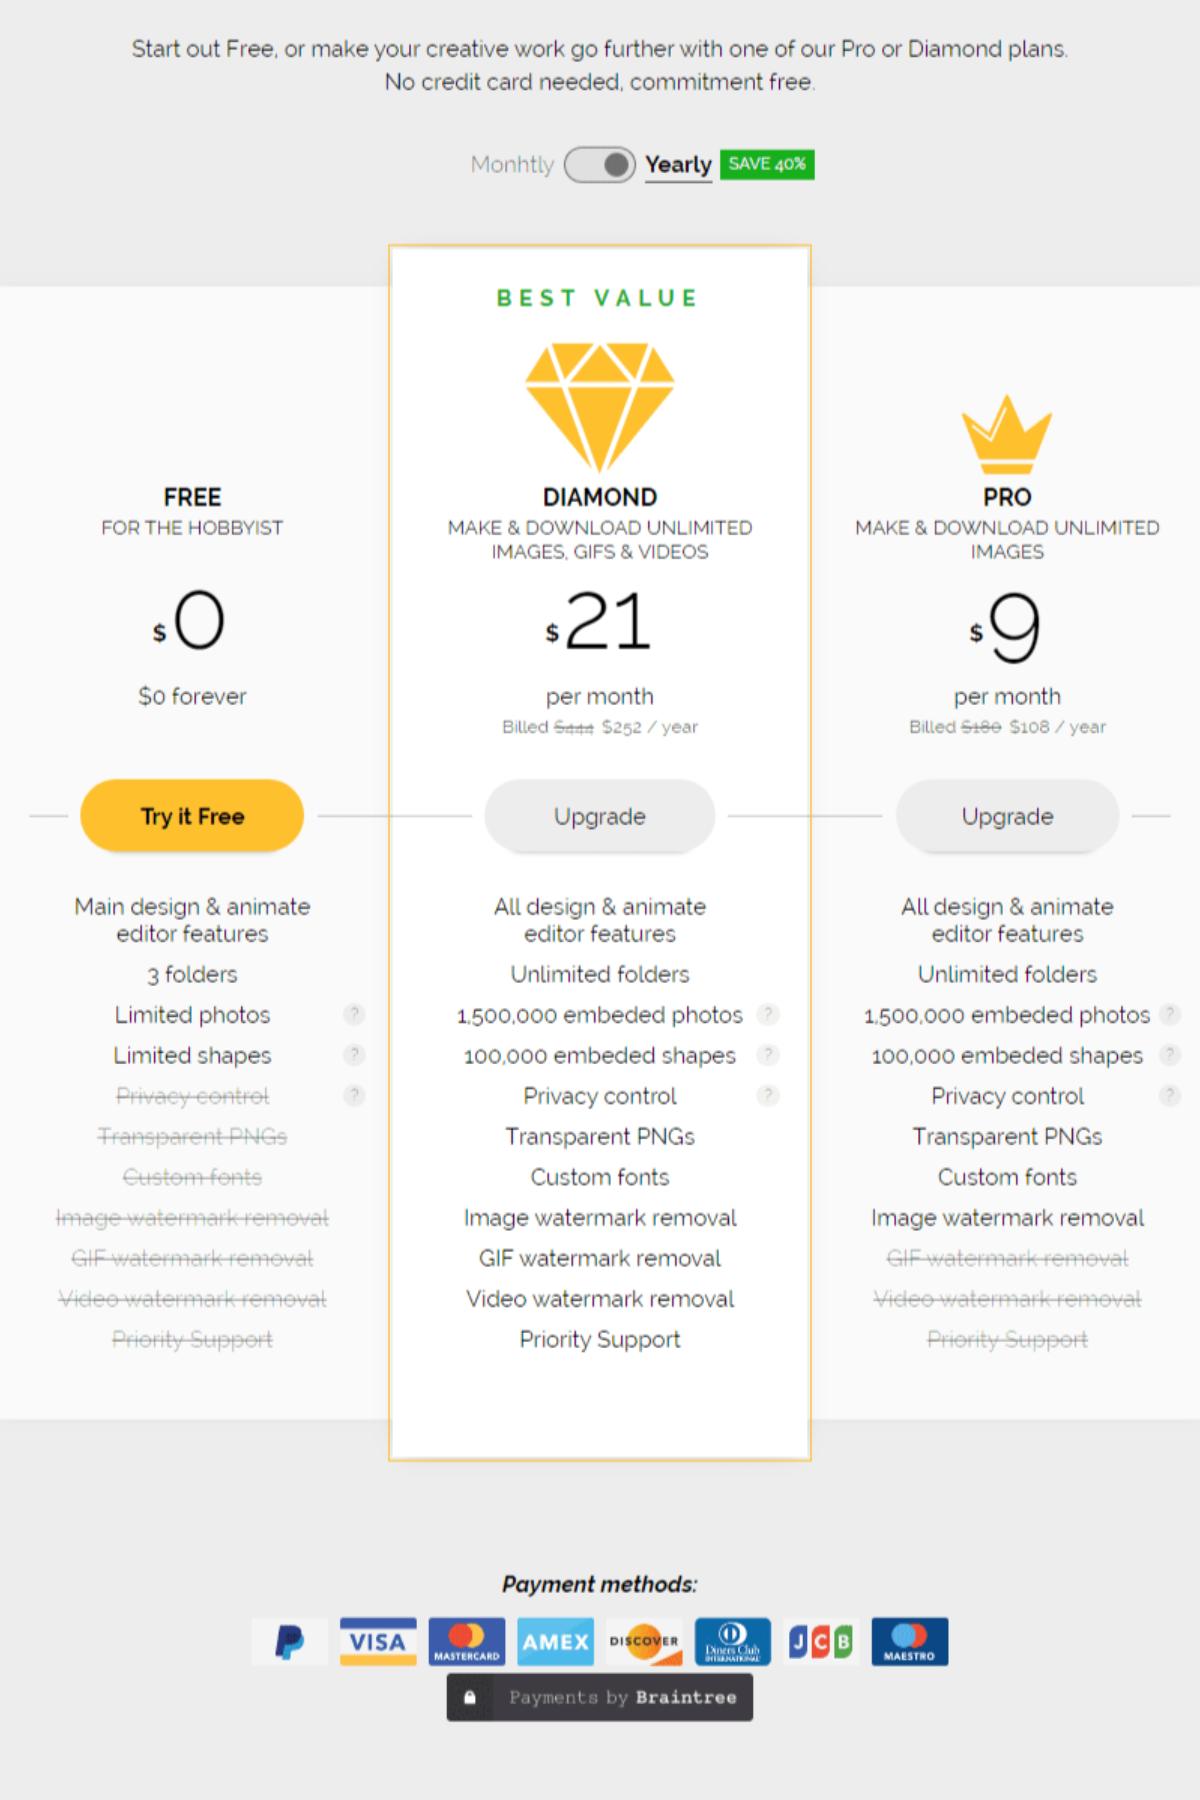 Upgrading to PixTeller DIAMOND or PRO subscriptions (FAQ)